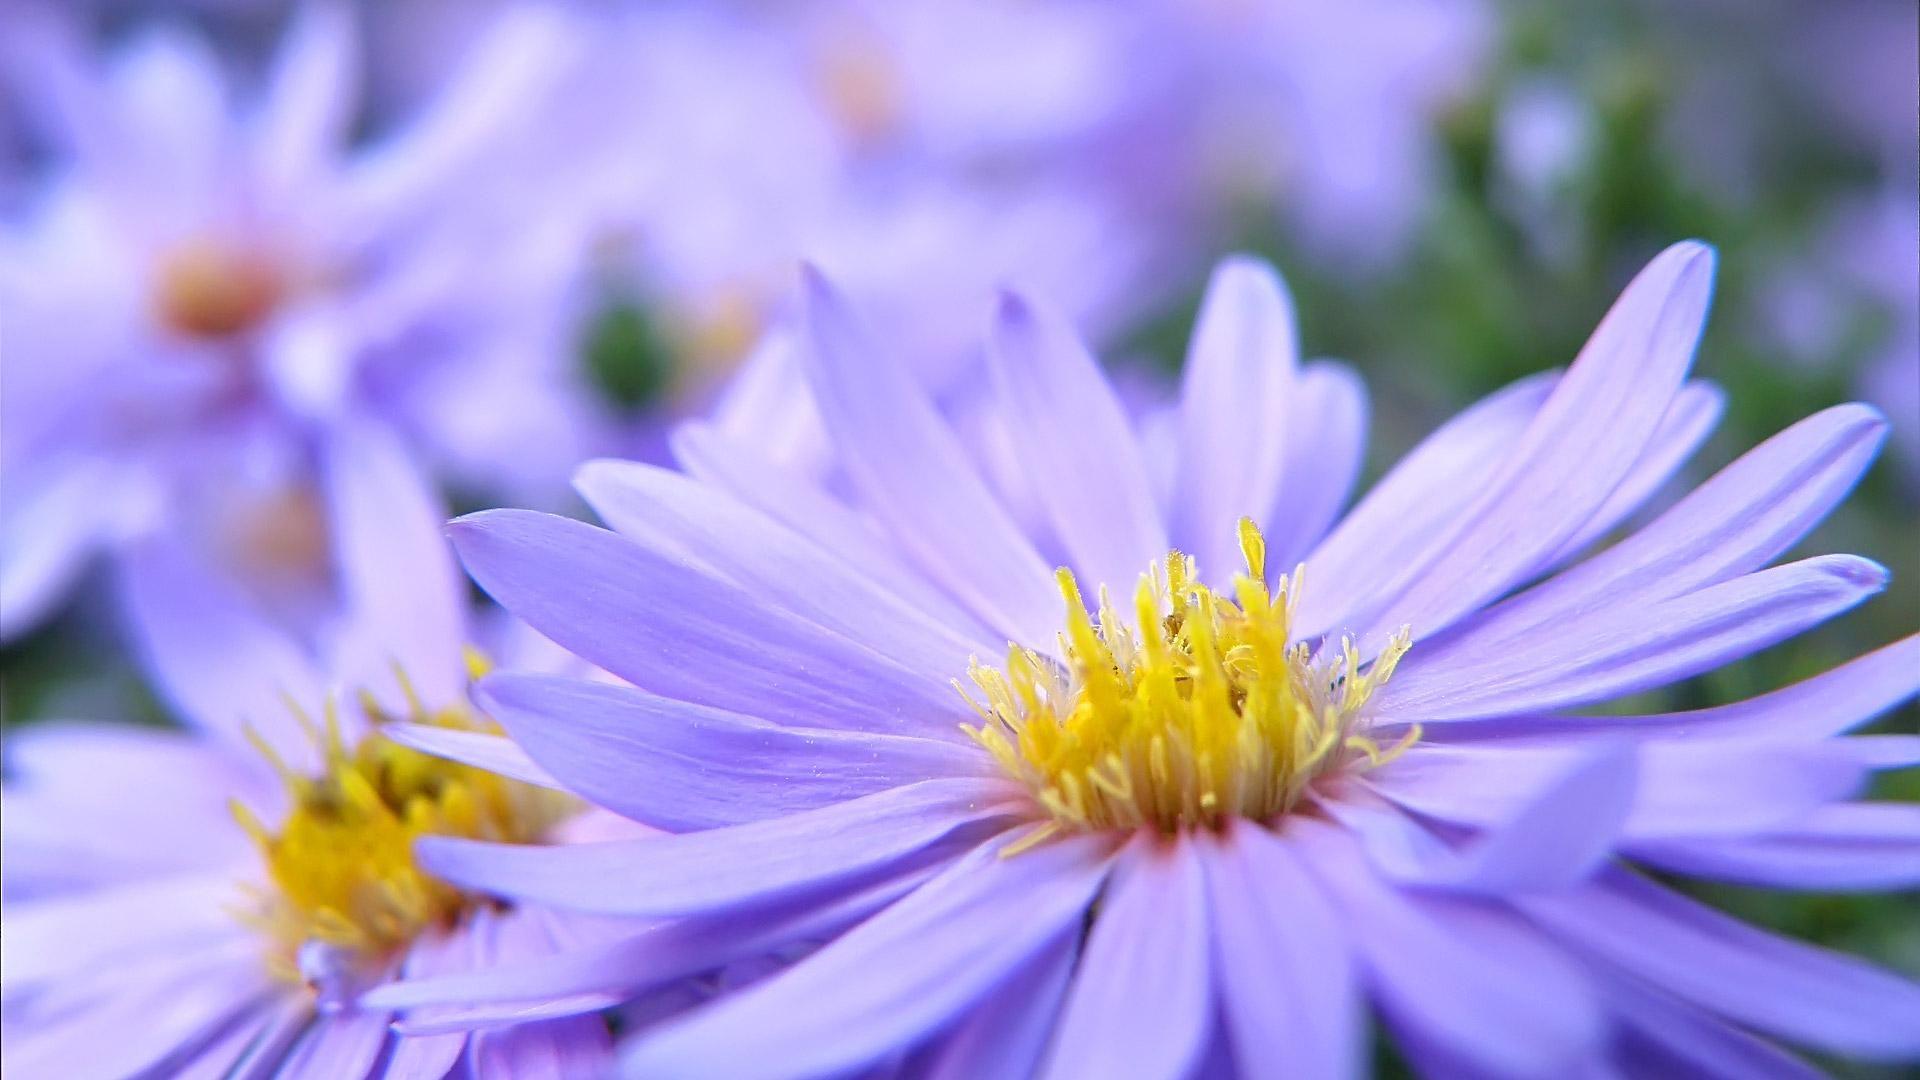 Beautiful Purple Daisy Flowers 19201080 1080p Widescreen Hd